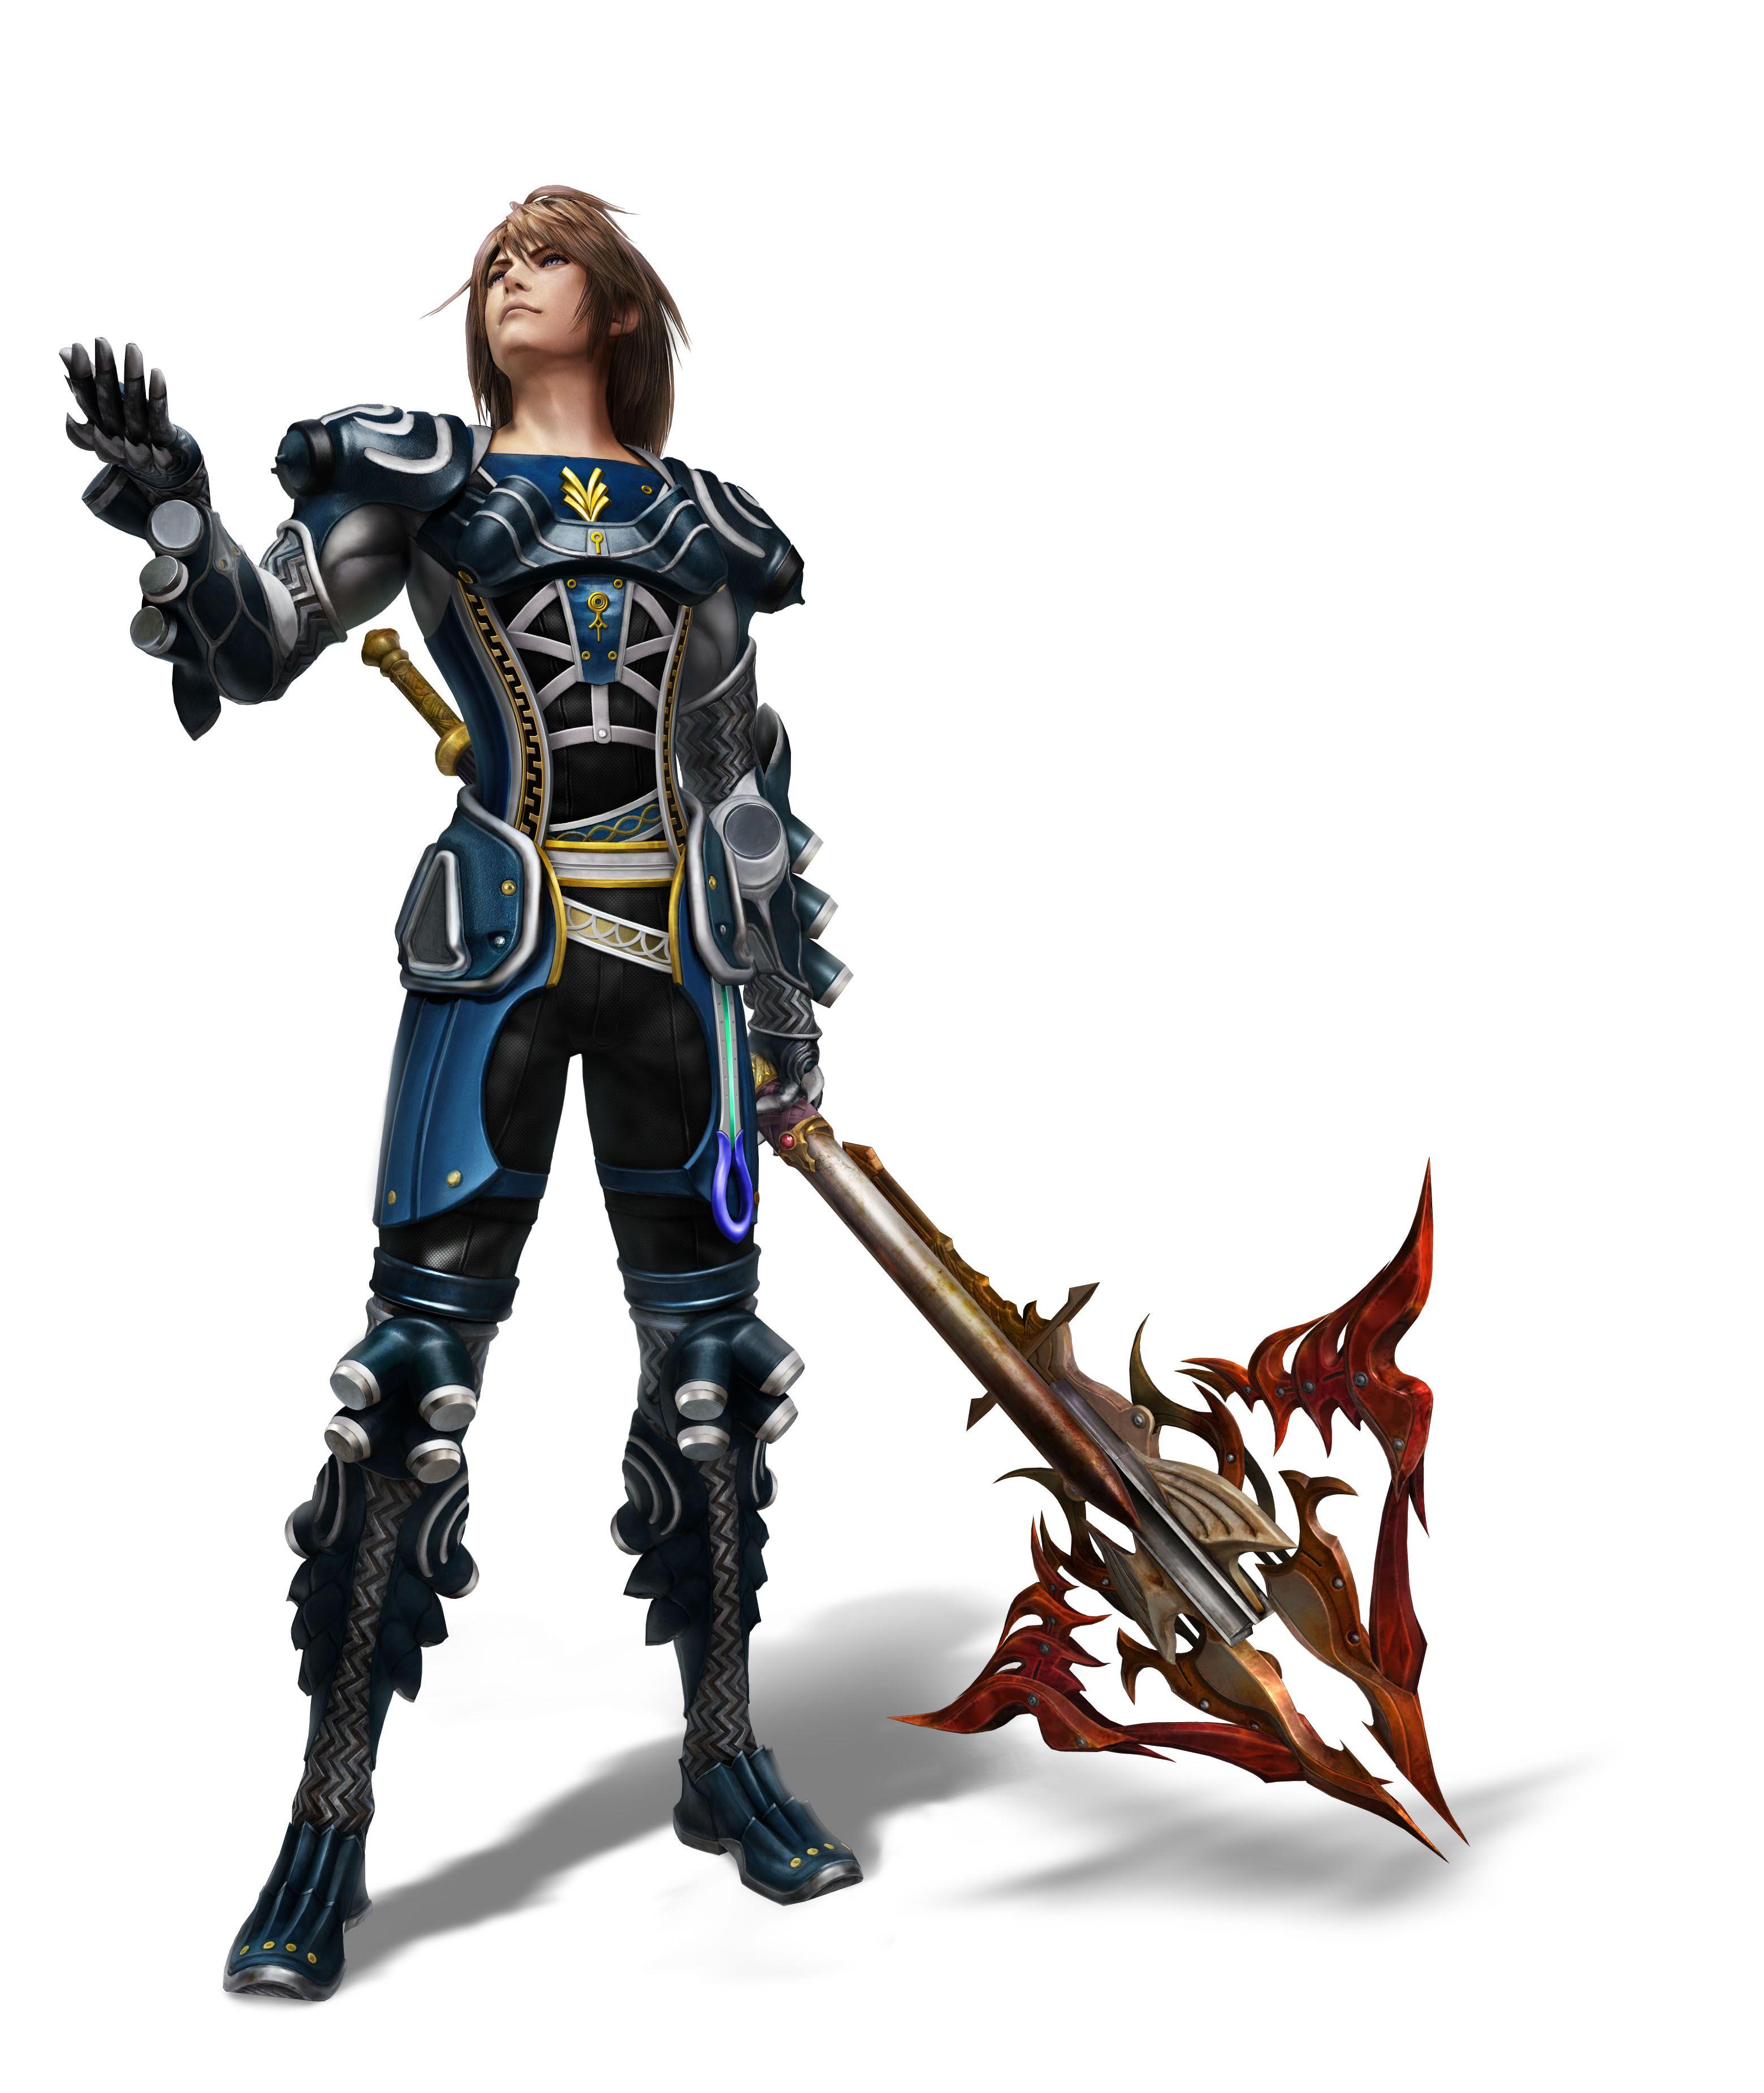 Final Fantasy Xiii Characters Final Fantasy XIII-2 A...